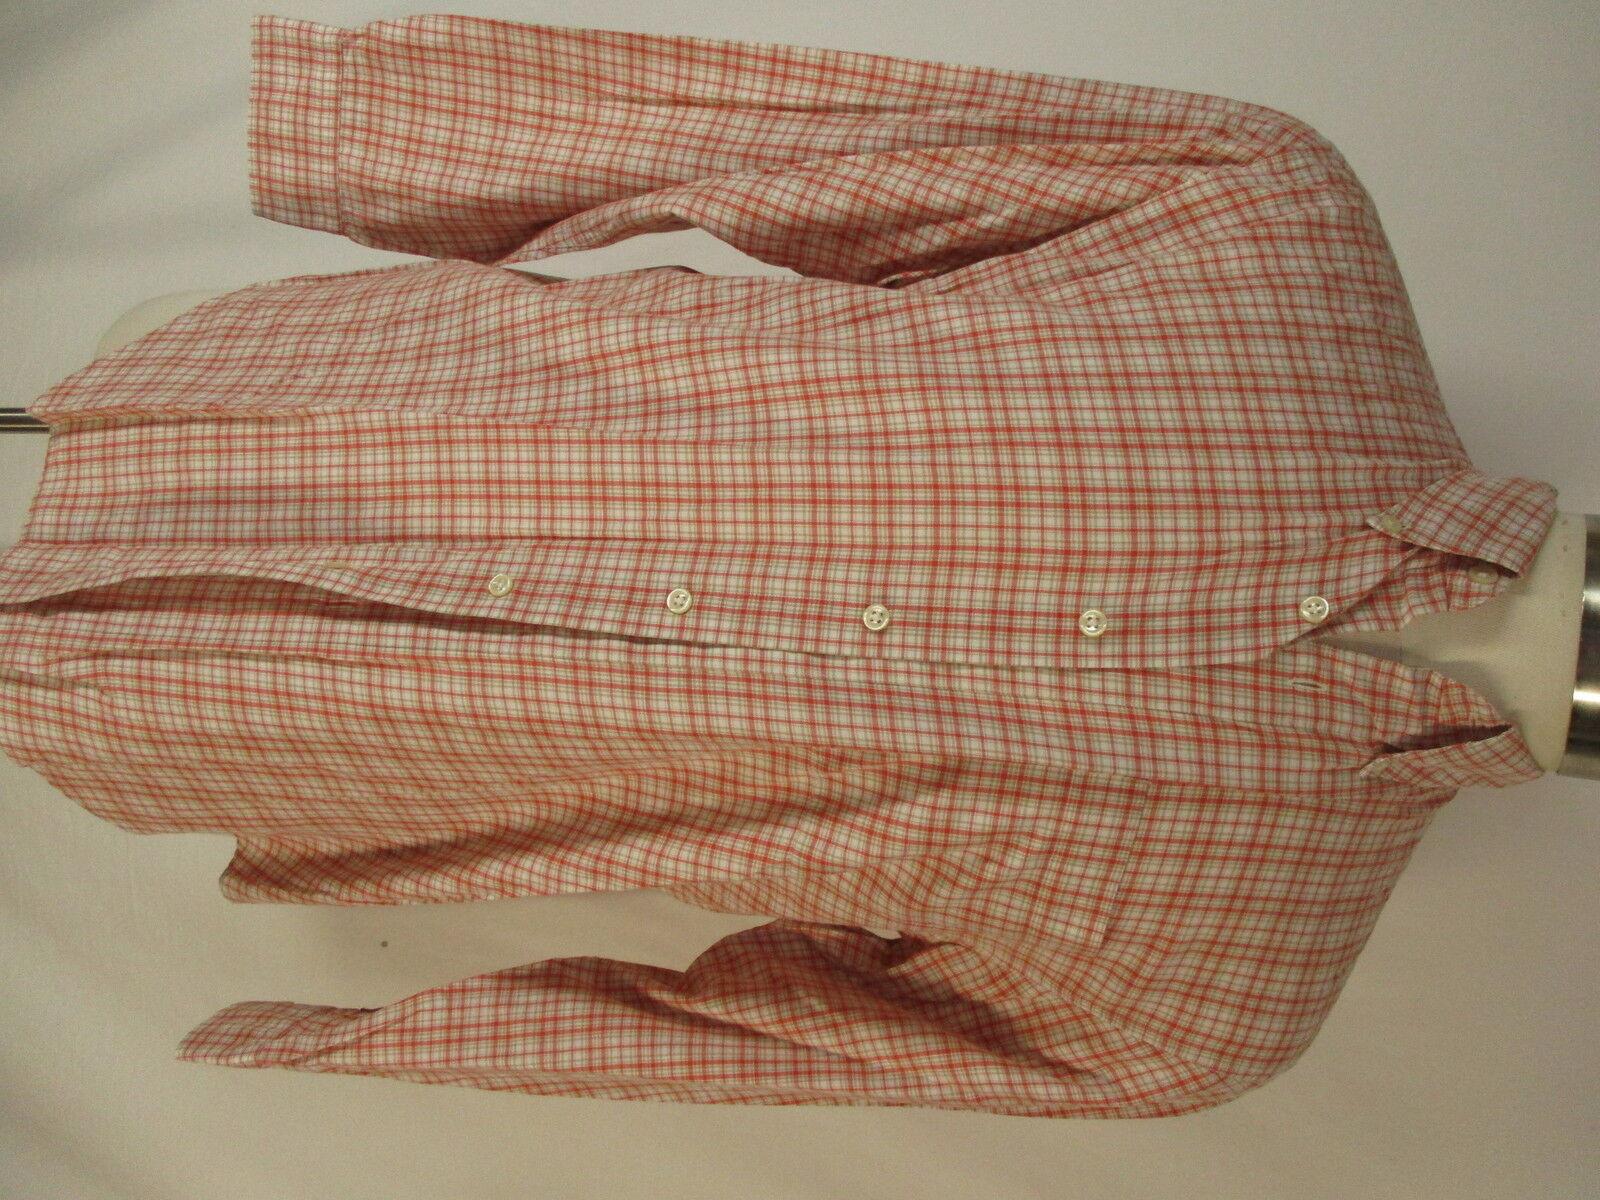 Filson Mens Red Plaid Long Sleeve Cotton Shirt M